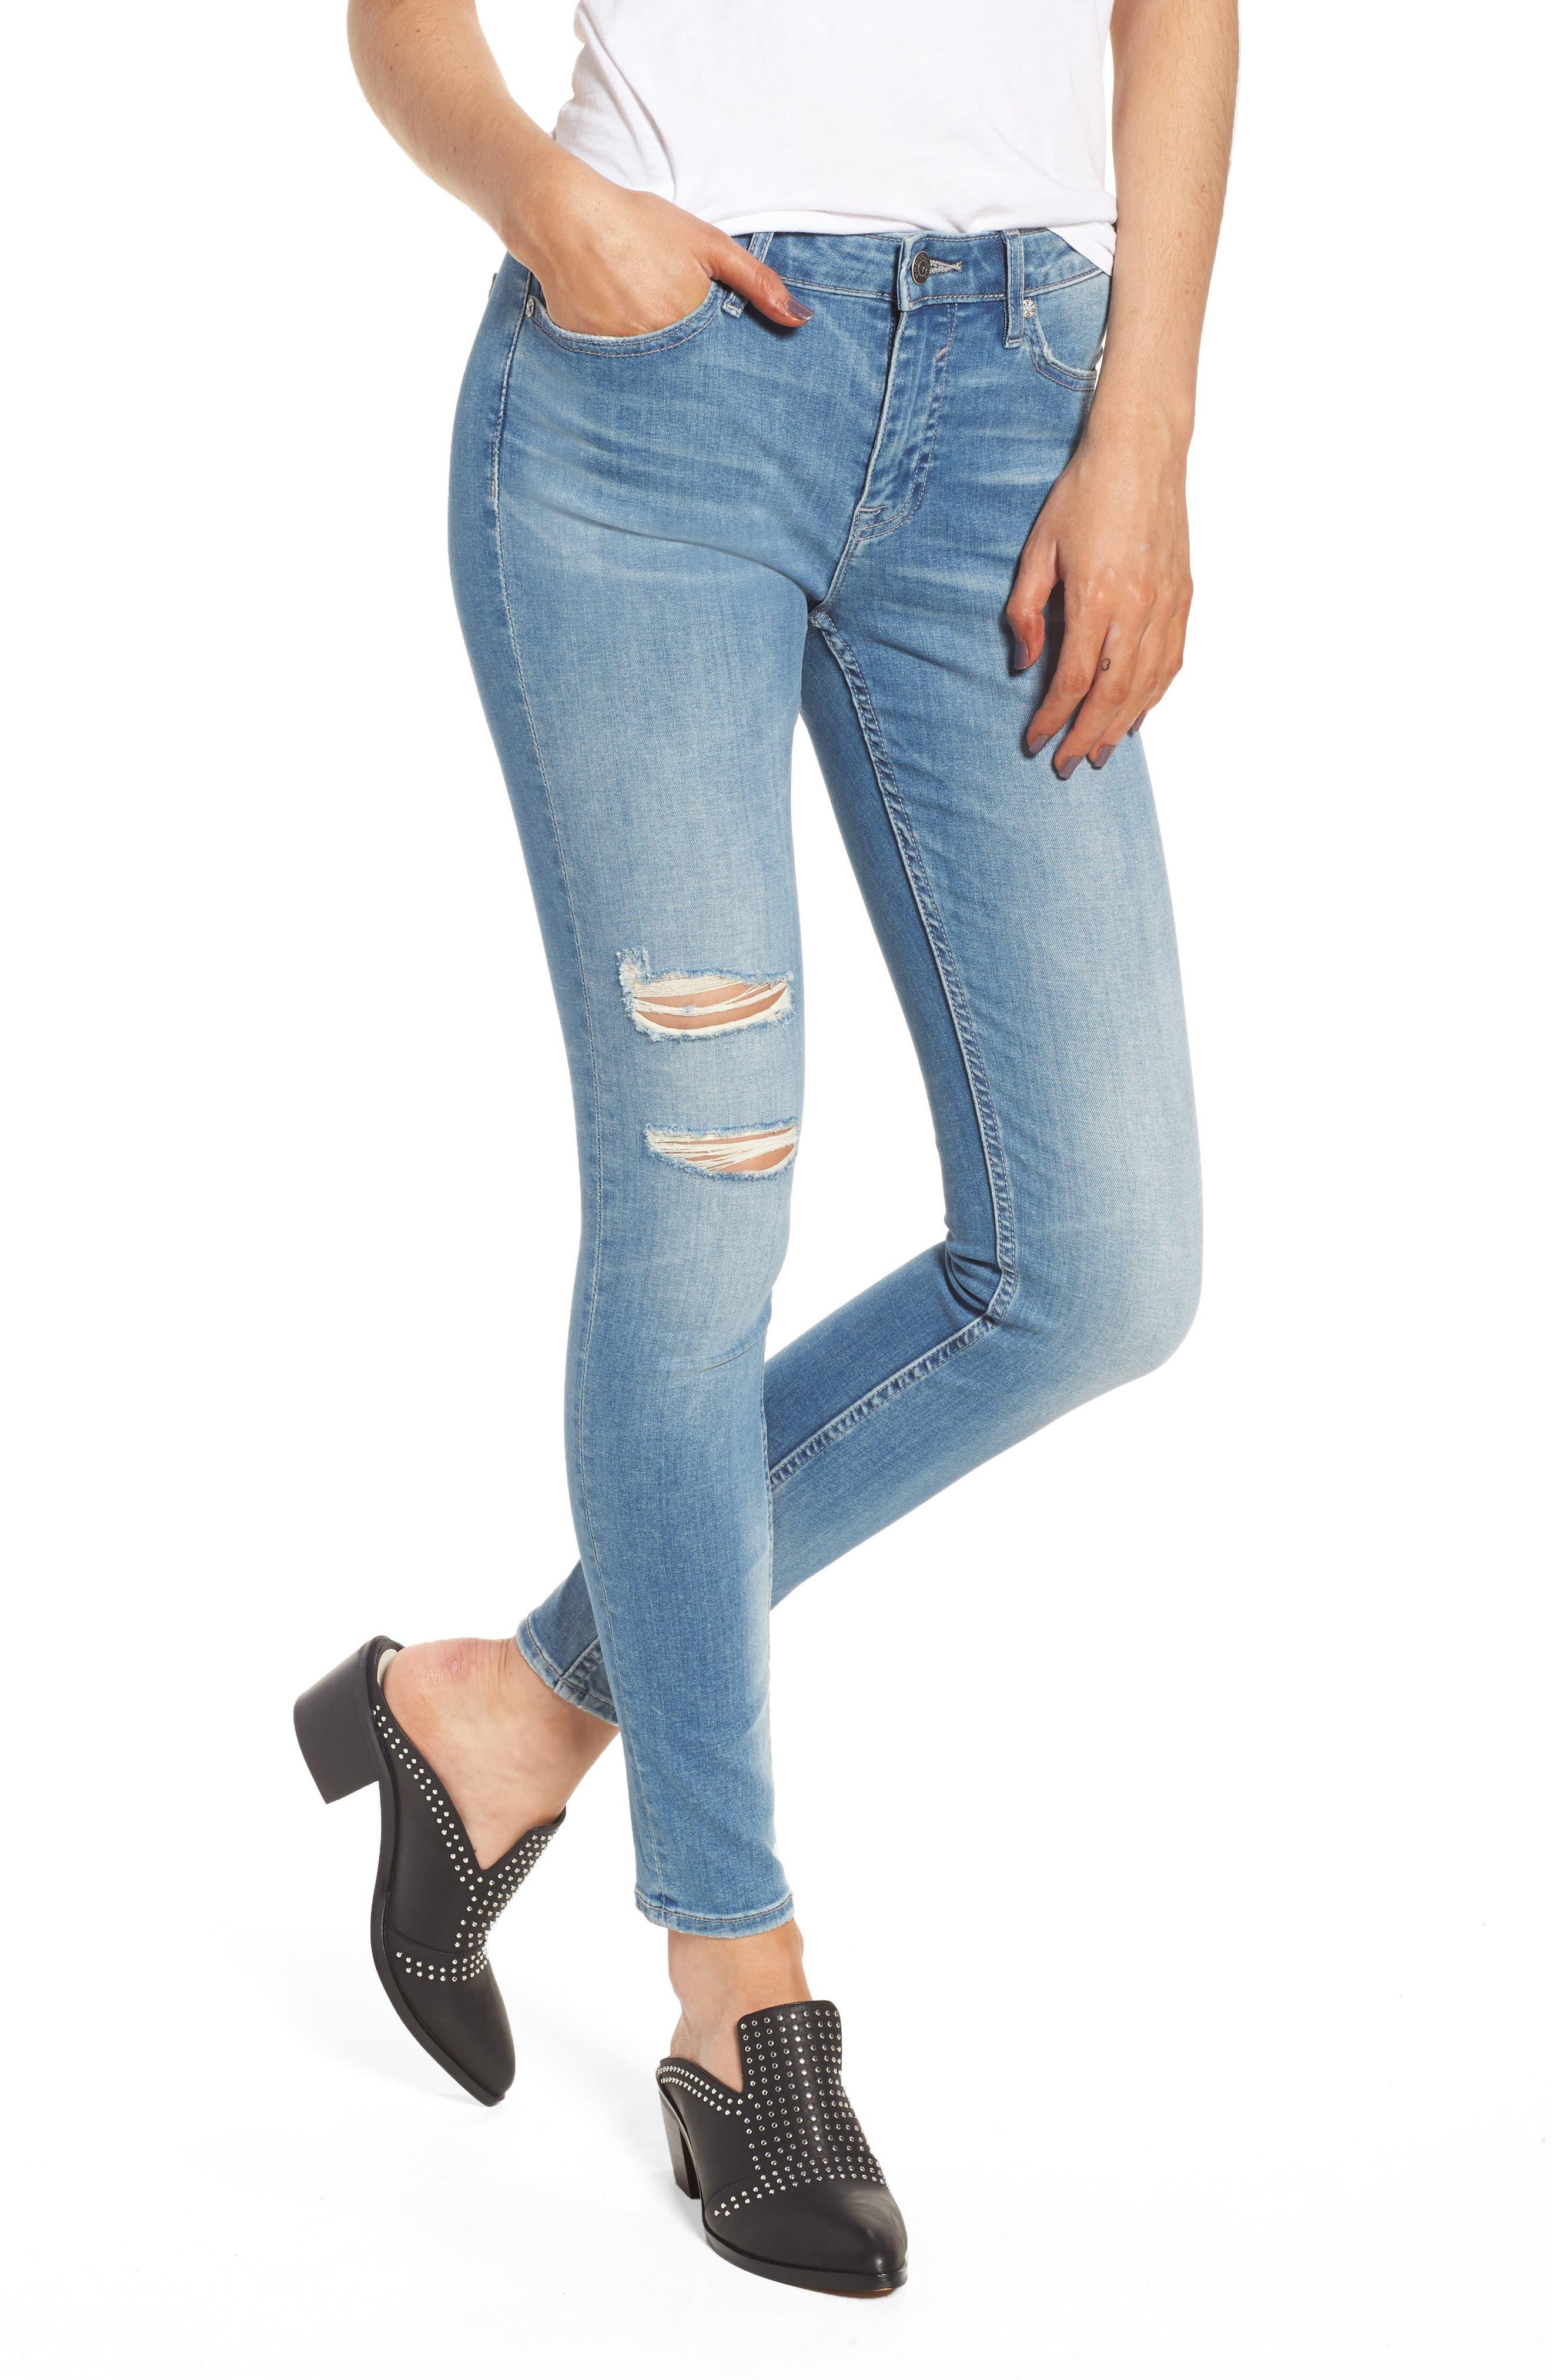 Marley Ripped Skinny Jeans,                             Main thumbnail 1, color,